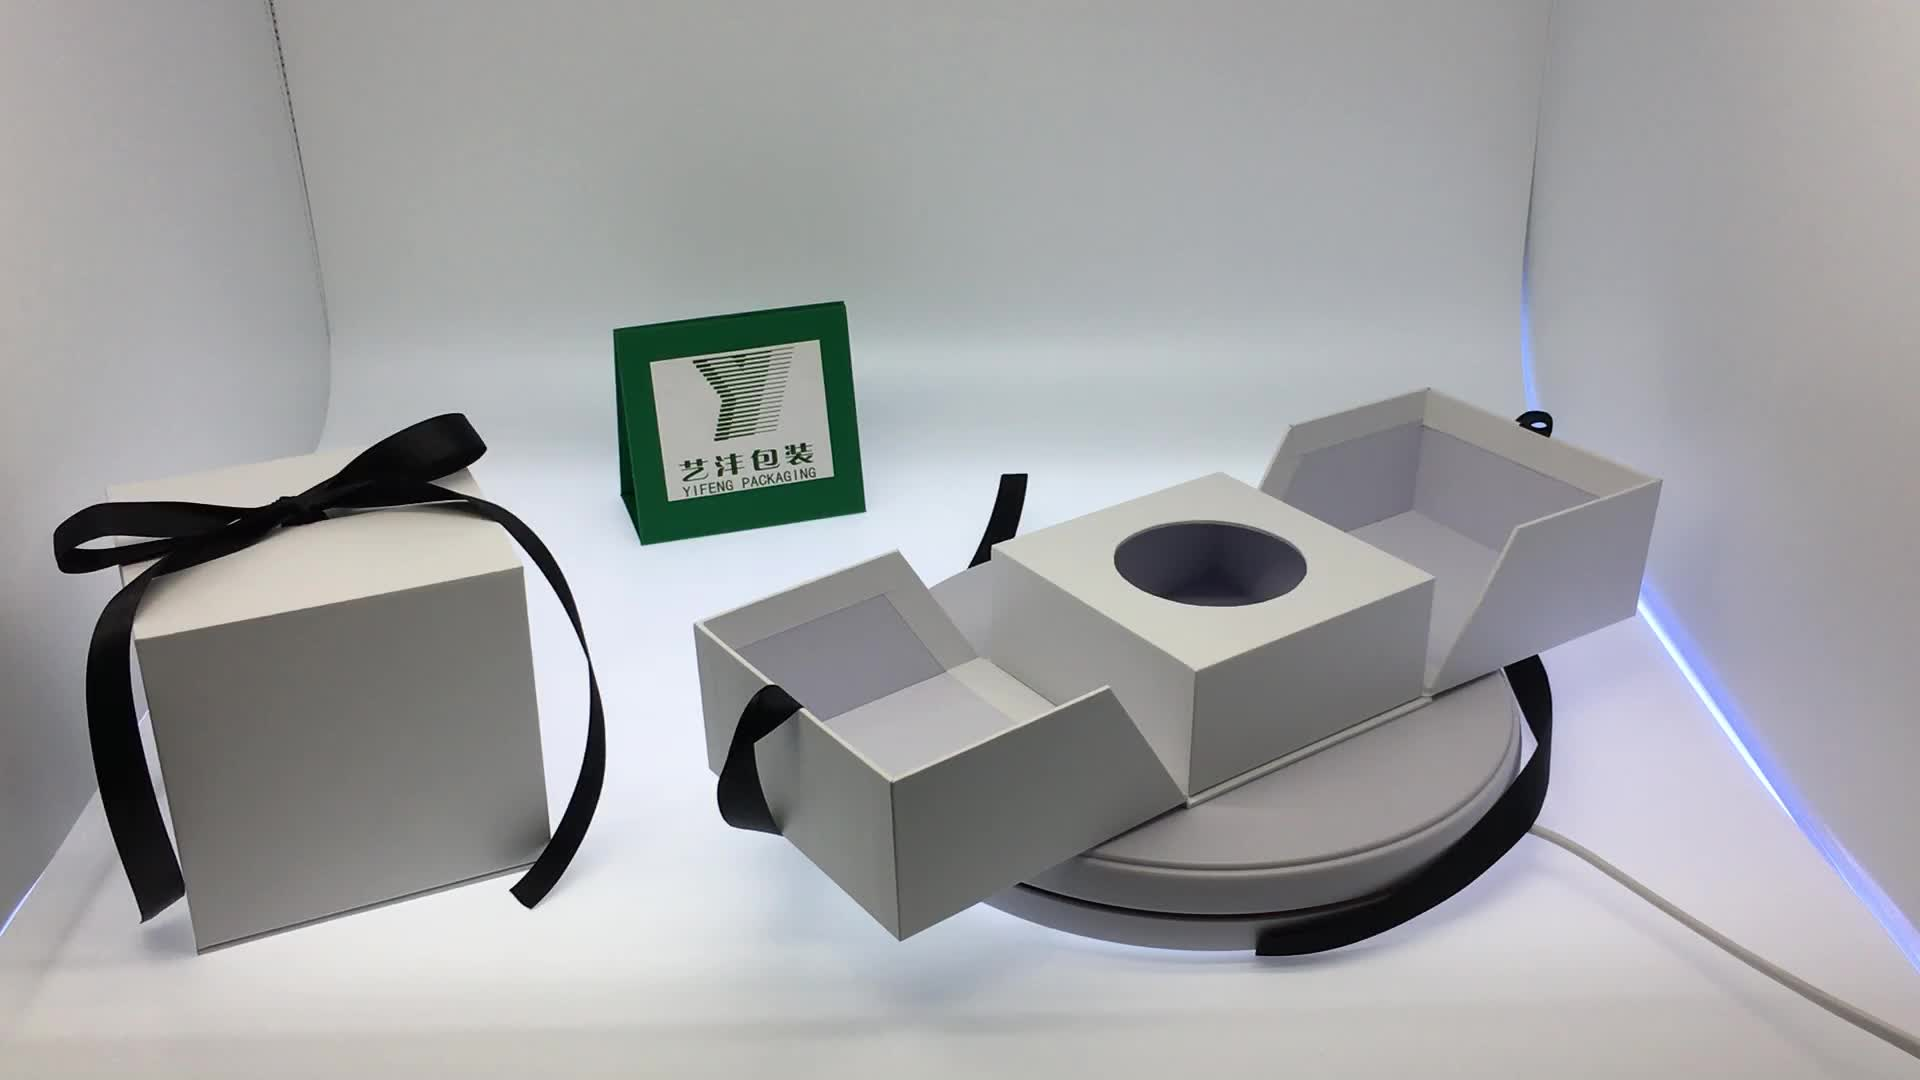 folding paper wine box, leather wine box, paper wine box wholesale liquor packaging